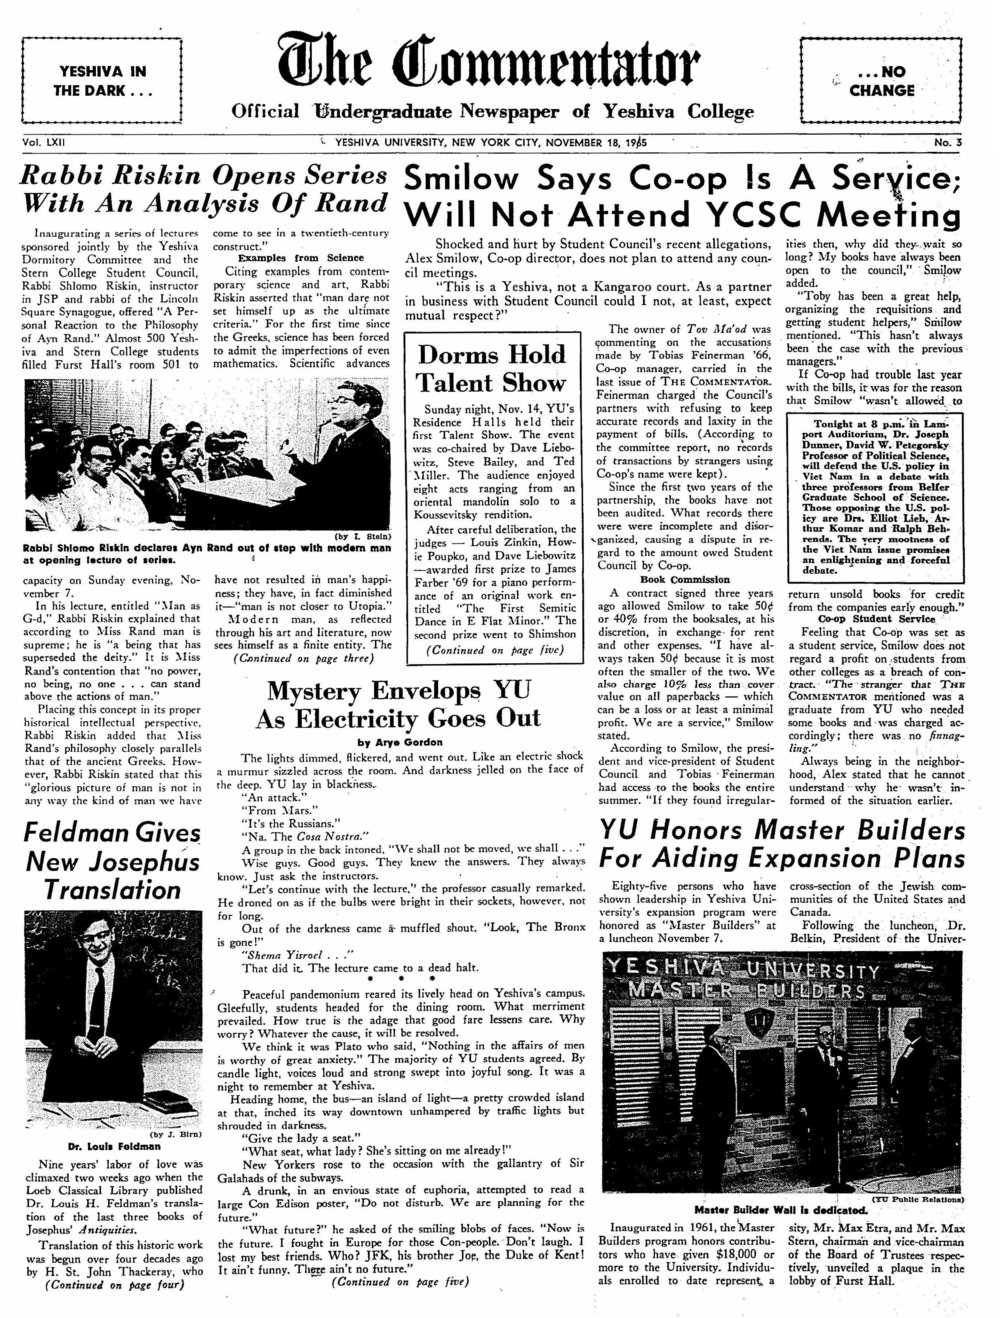 1965.11.18.TC--Feldman Gives Nnew Josephus Translation_Page_1.jpg